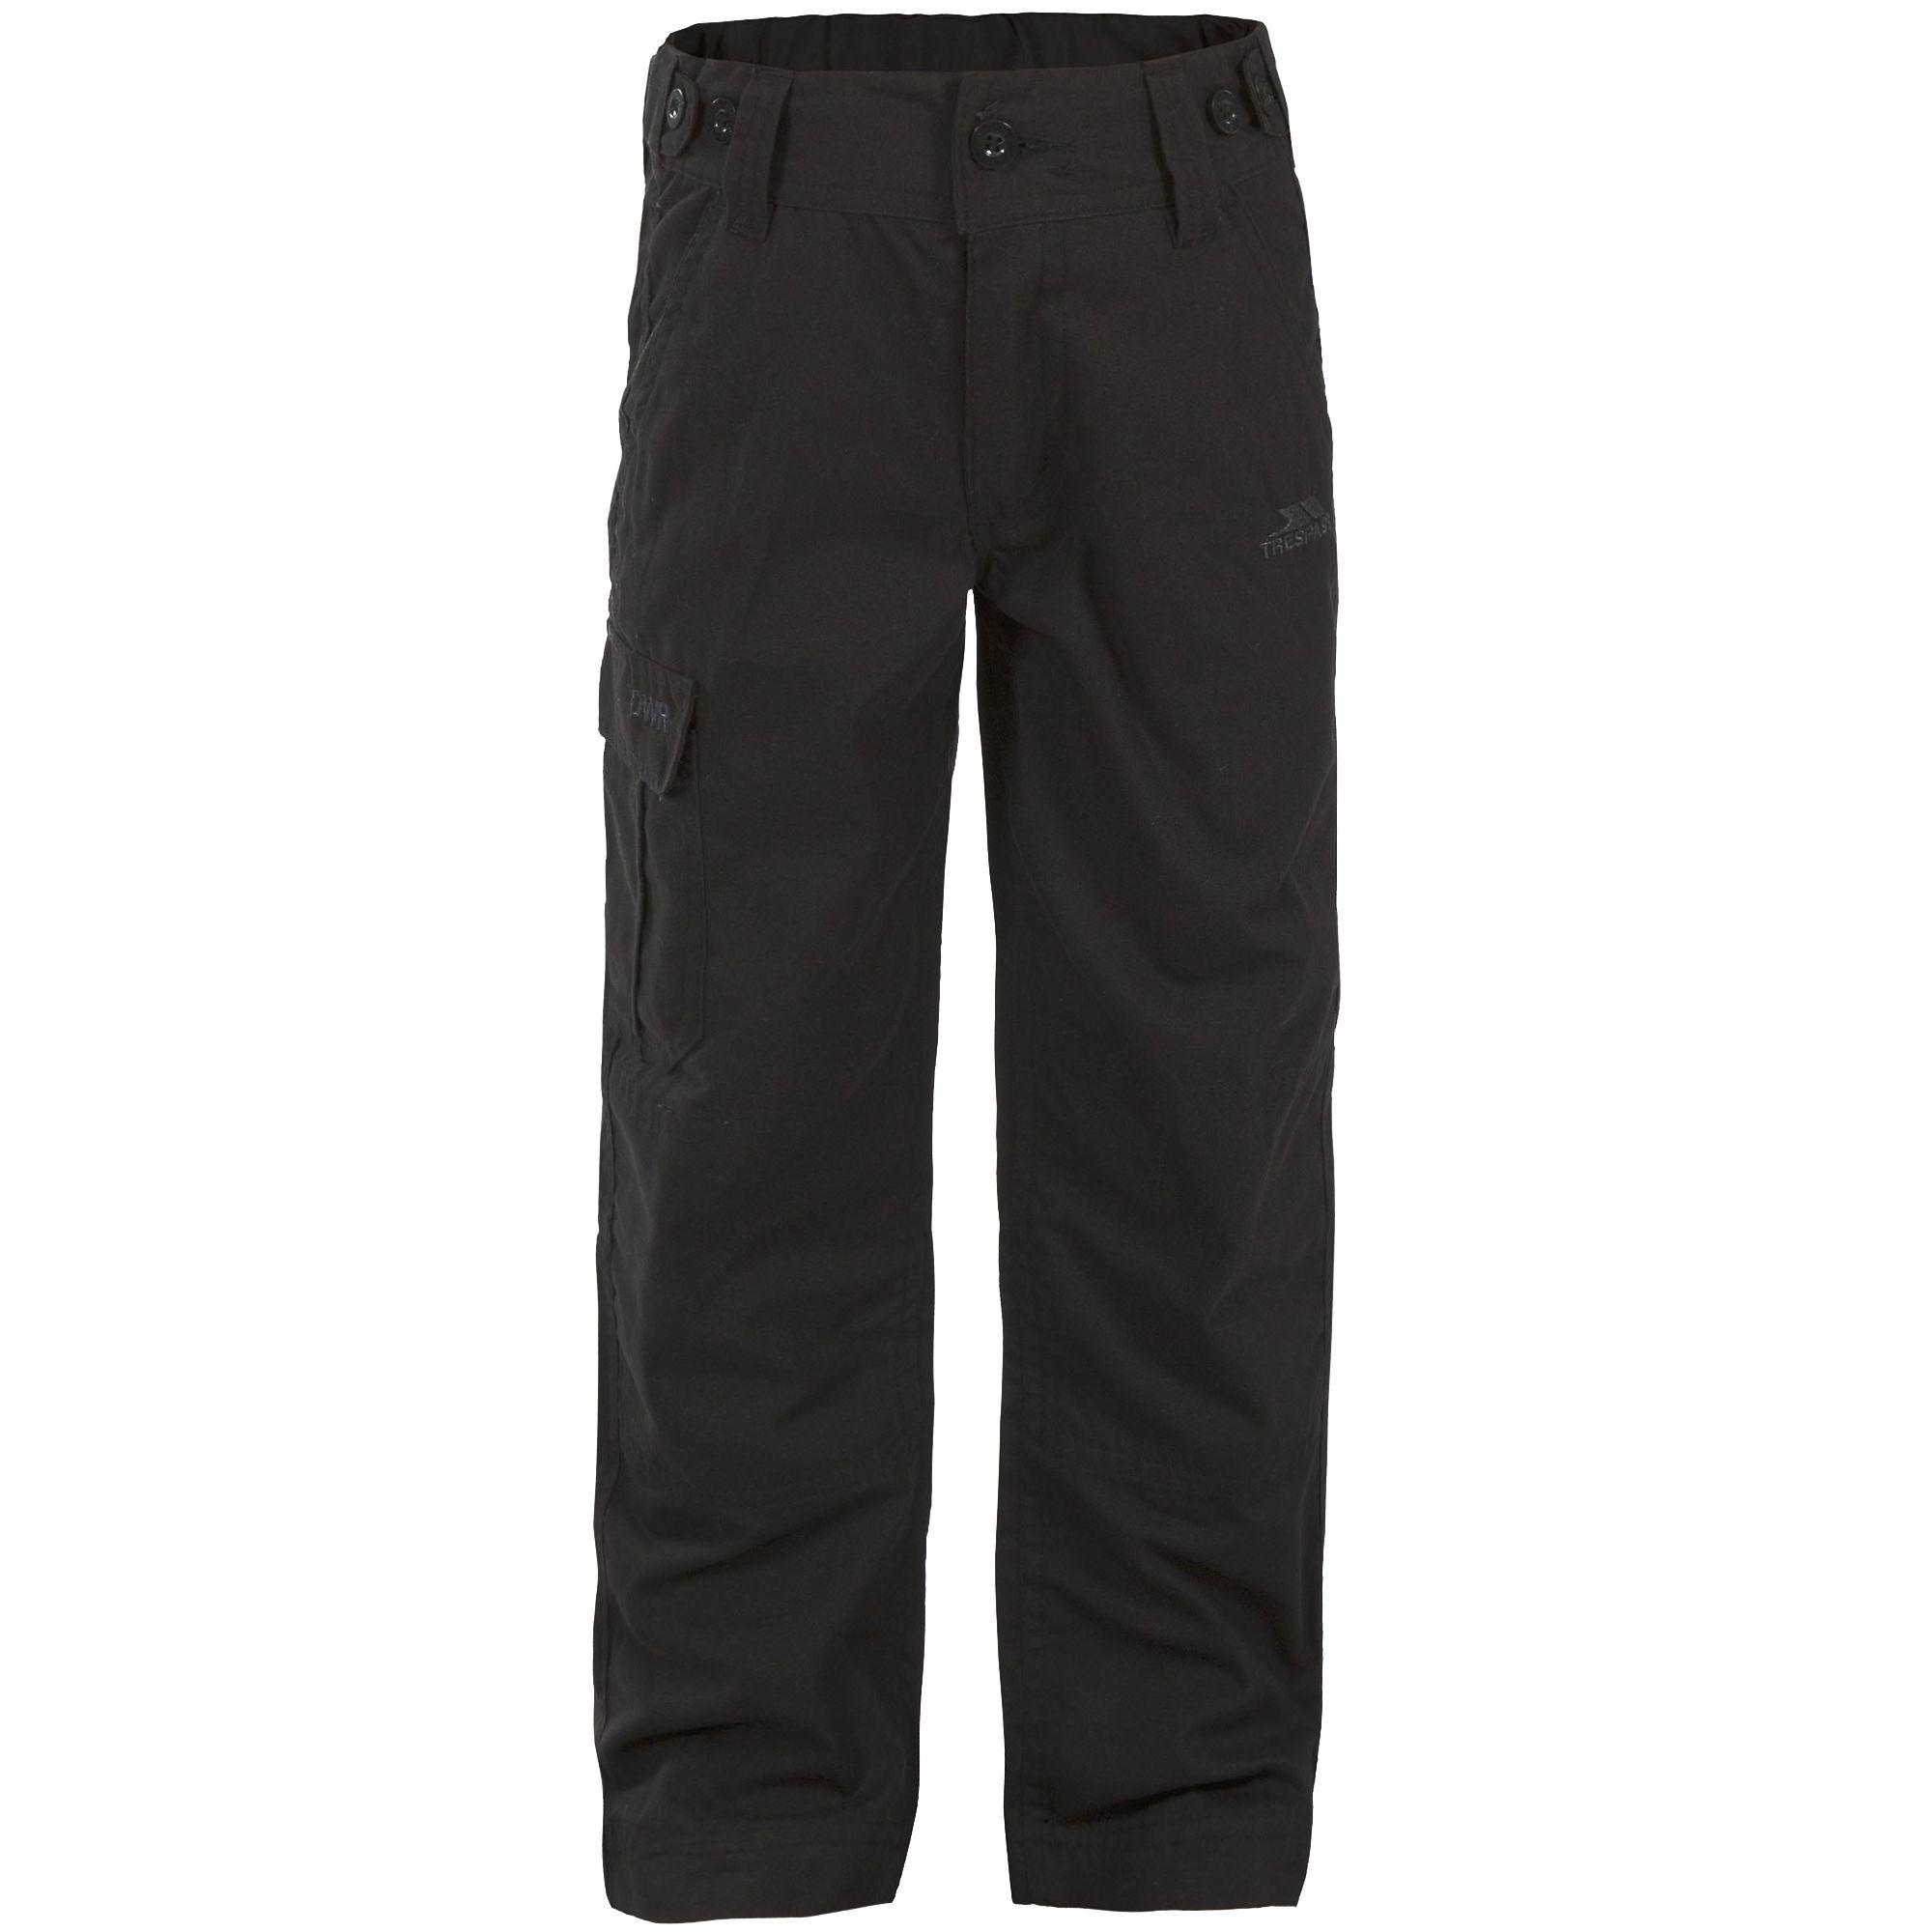 Trespass Childrens Boys Ardle Walking Trousers